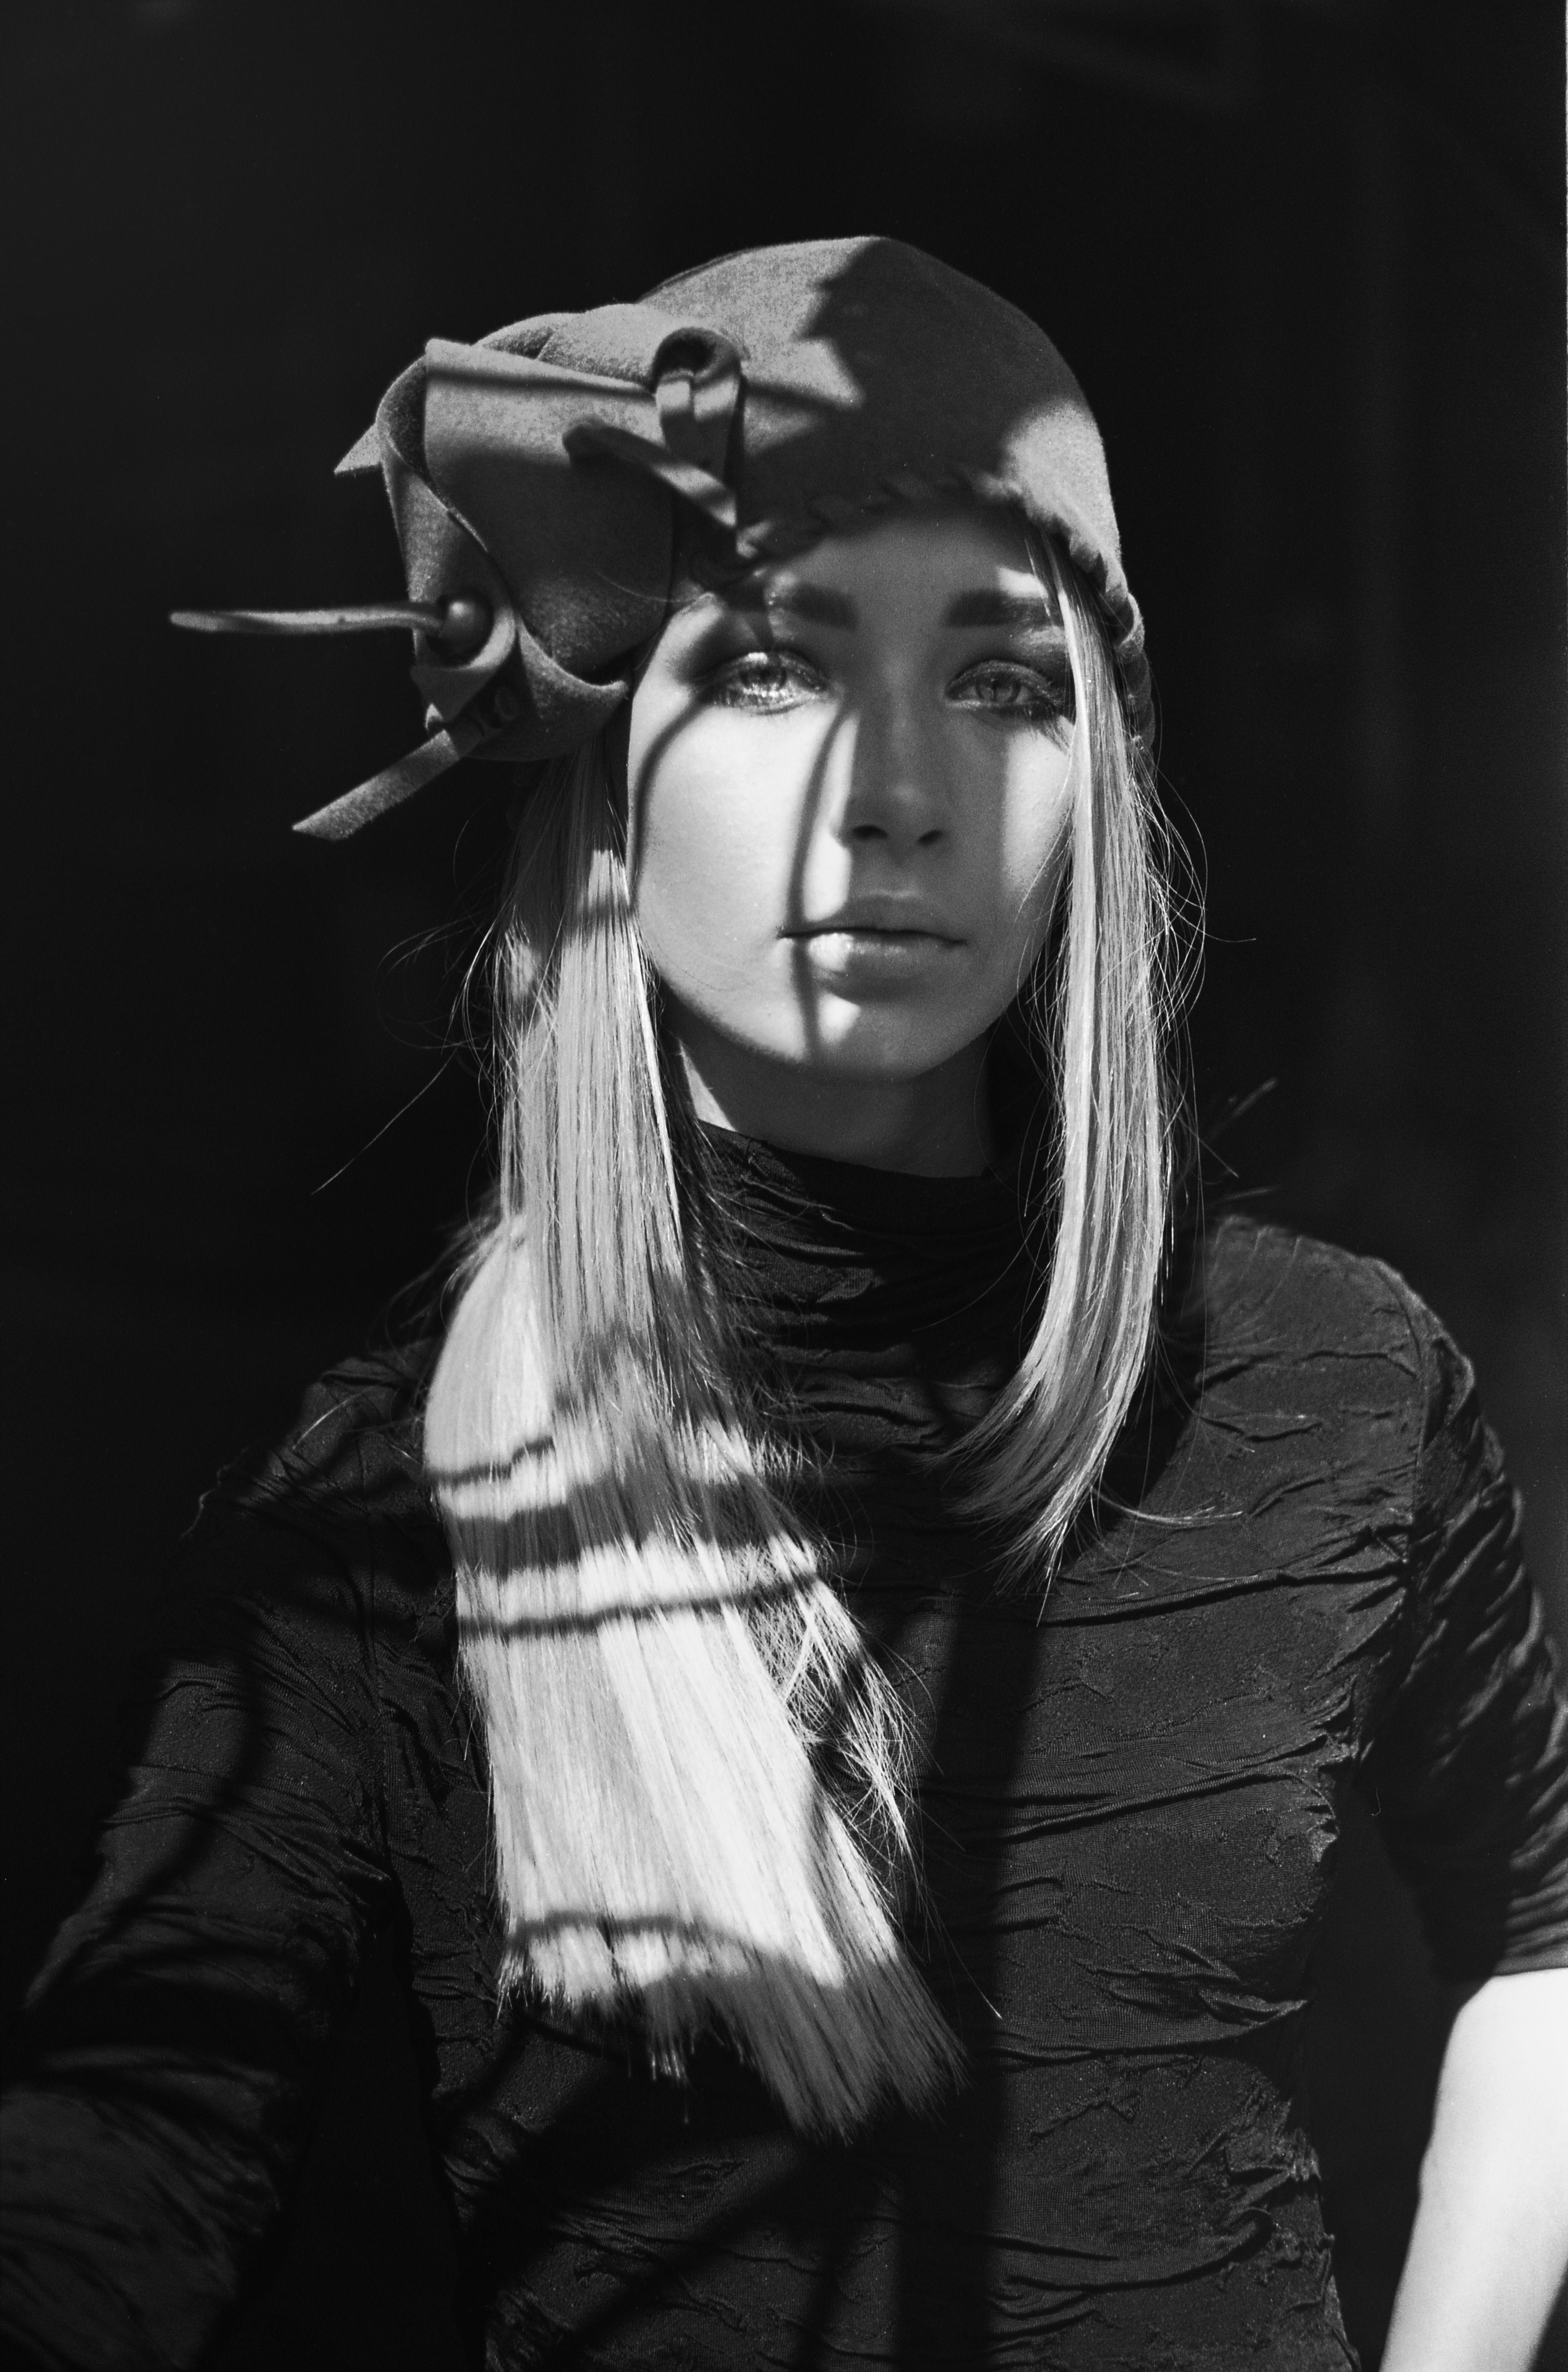 Leica m3 black and white portrait film fashion photography bw film 35mm film kodak t max 400 ukraine girl